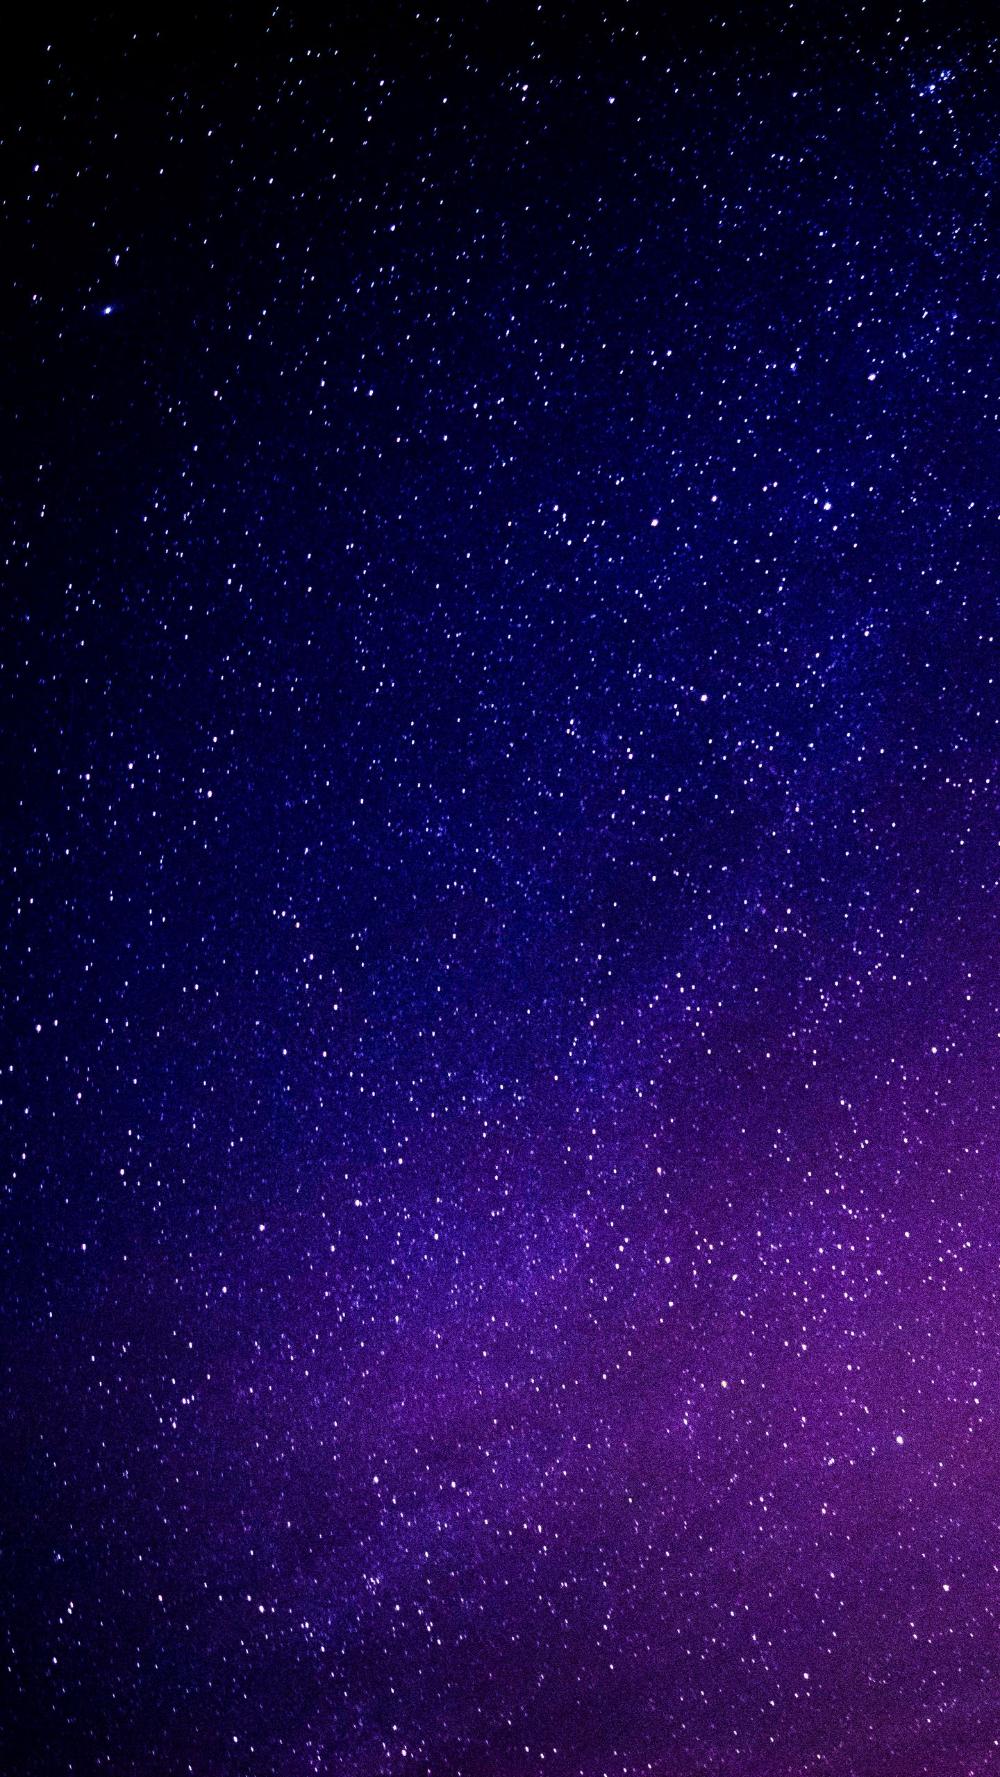 Download wallpaper 1440x2560 starry sky, galaxy, glitter, night qhd samsung galaxy s6, s7, edge, note, lg g4 hd background